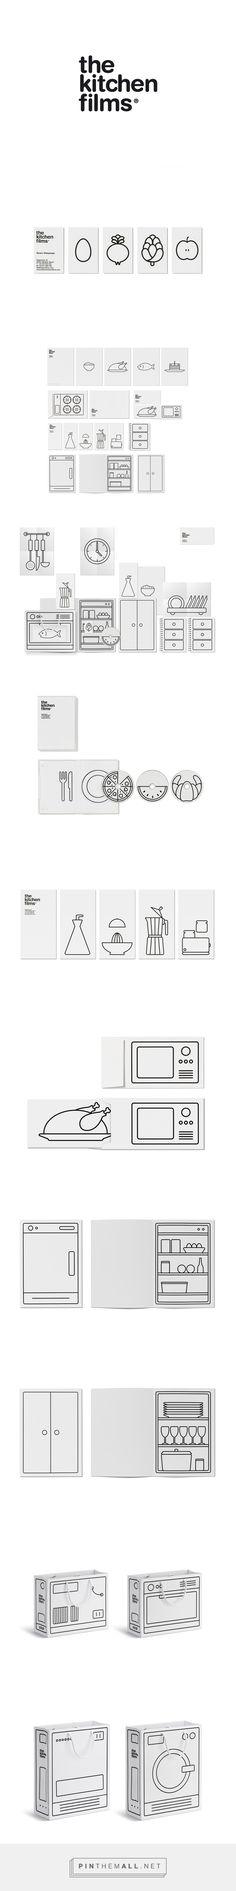 Branding : The Kitchen Films by Jorge Alavedra – AMS Design Blog - created via https://pinthemall.net